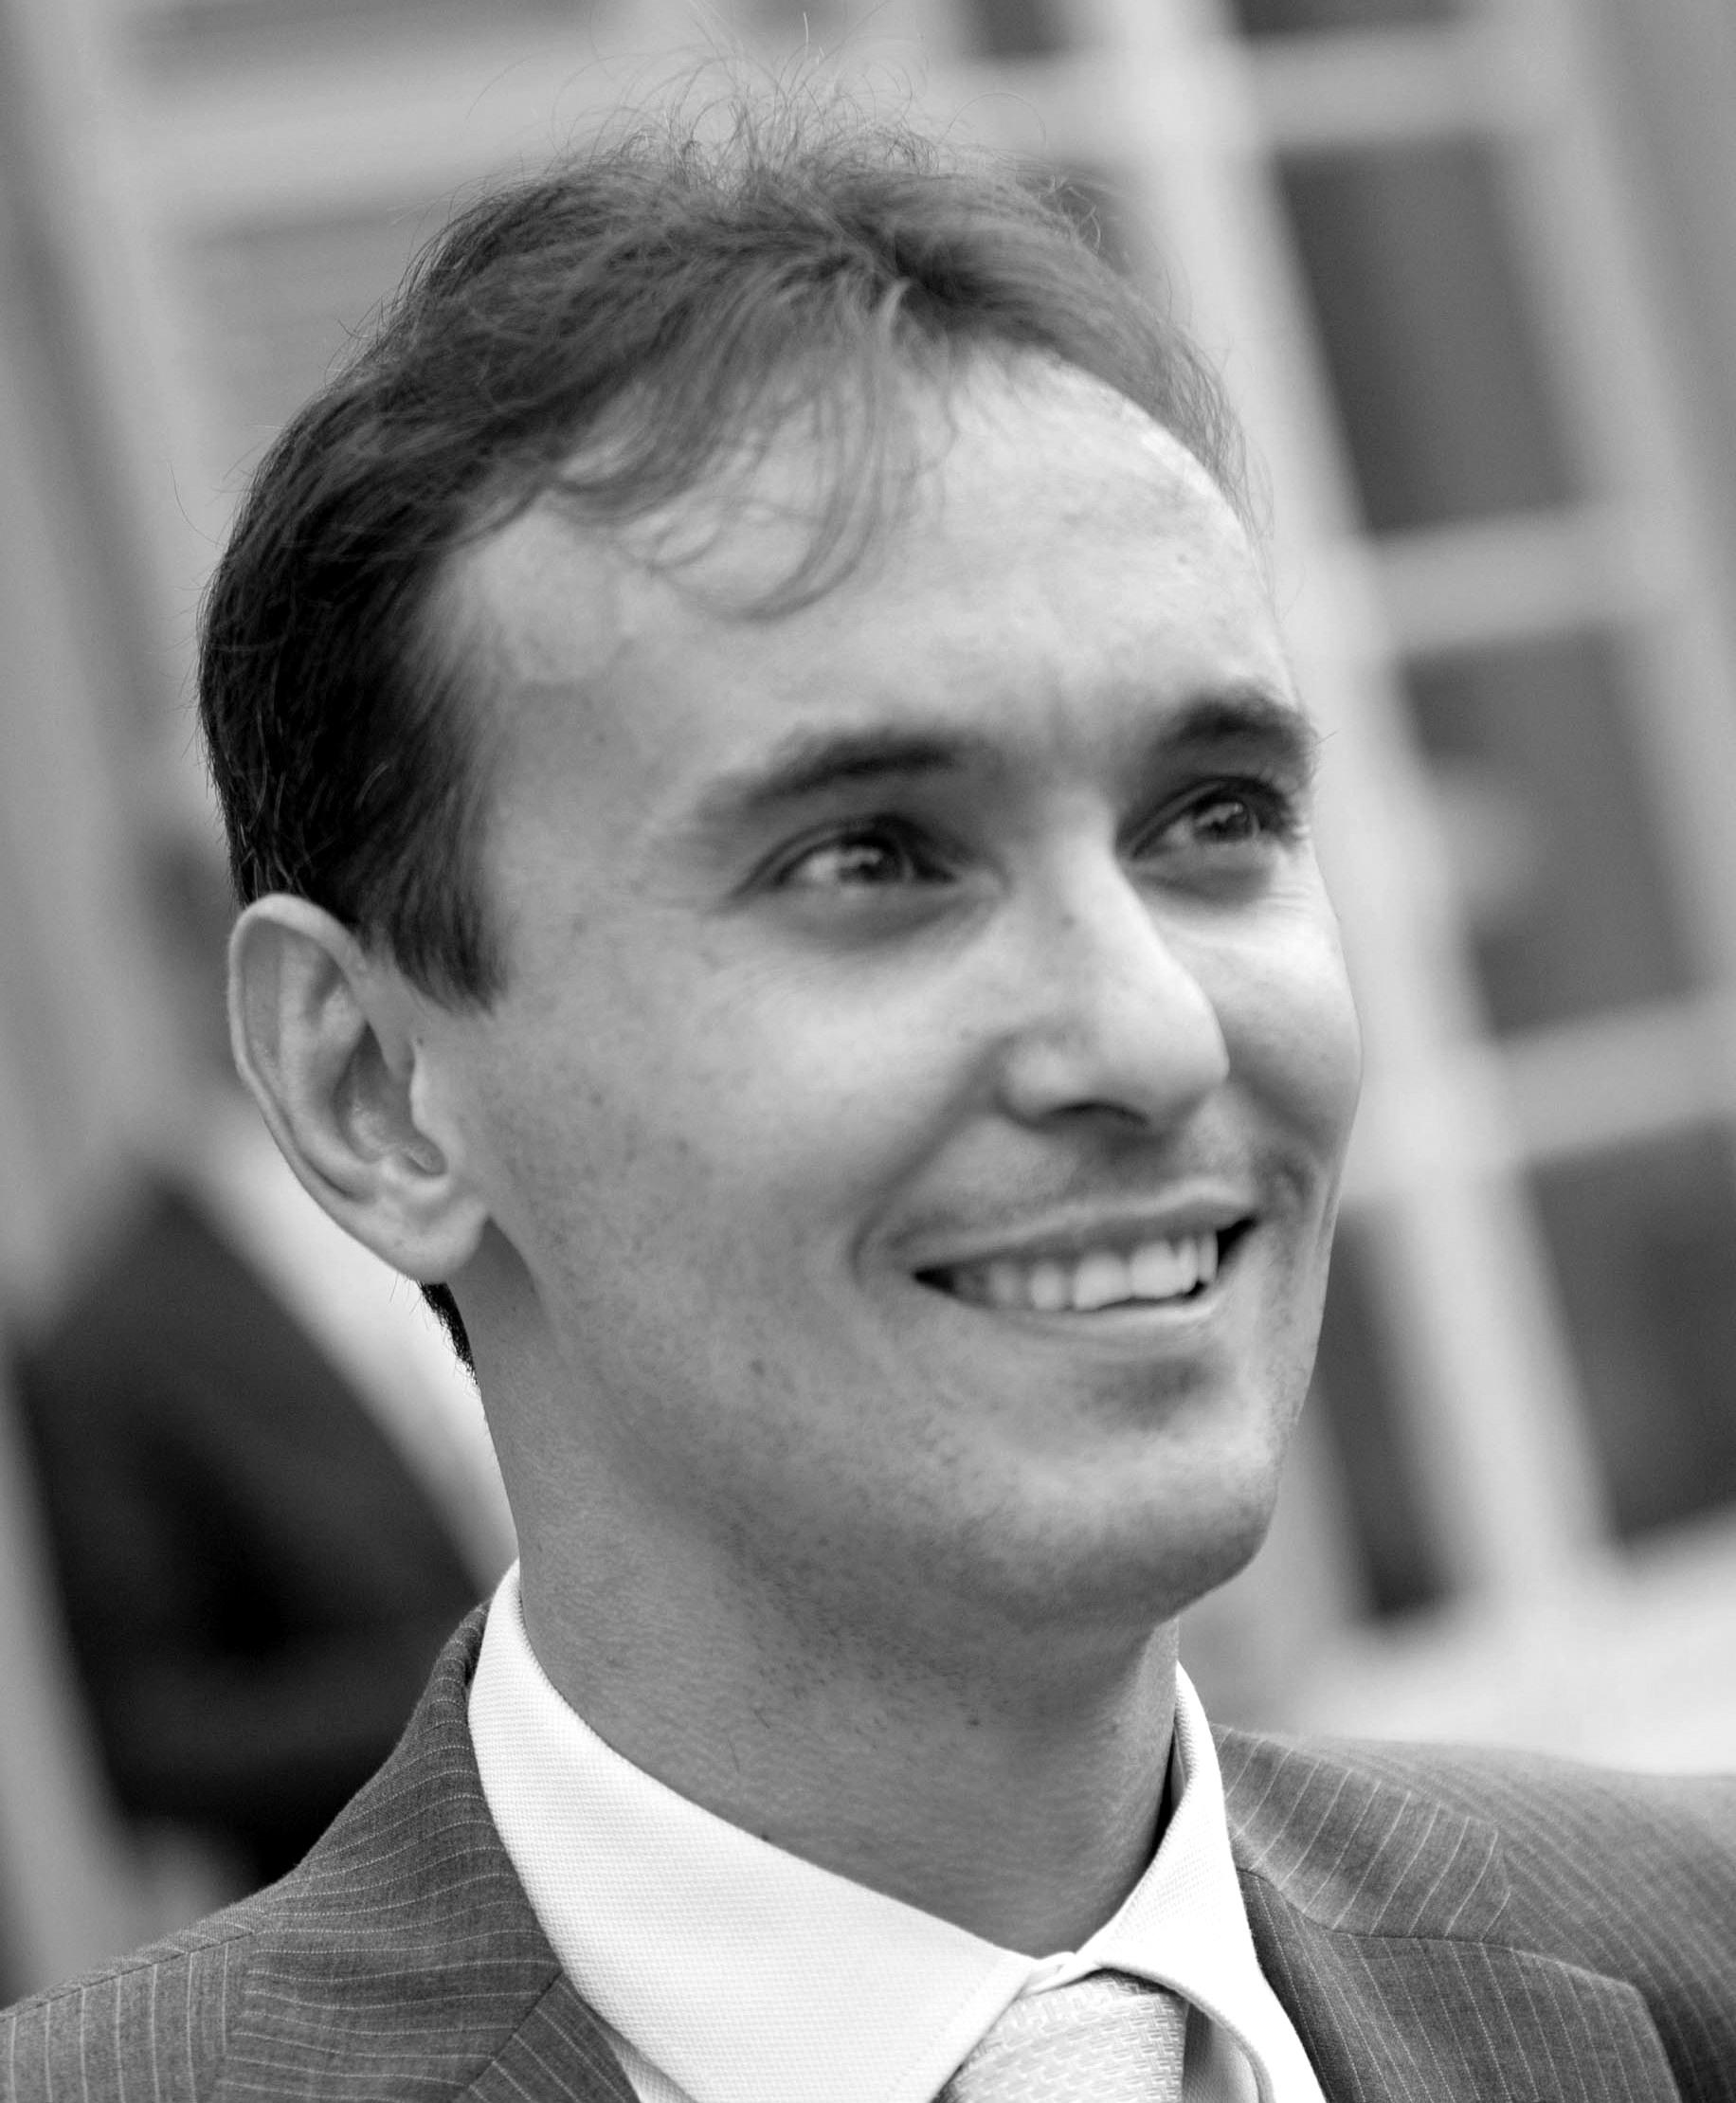 Alberto Berettarossa